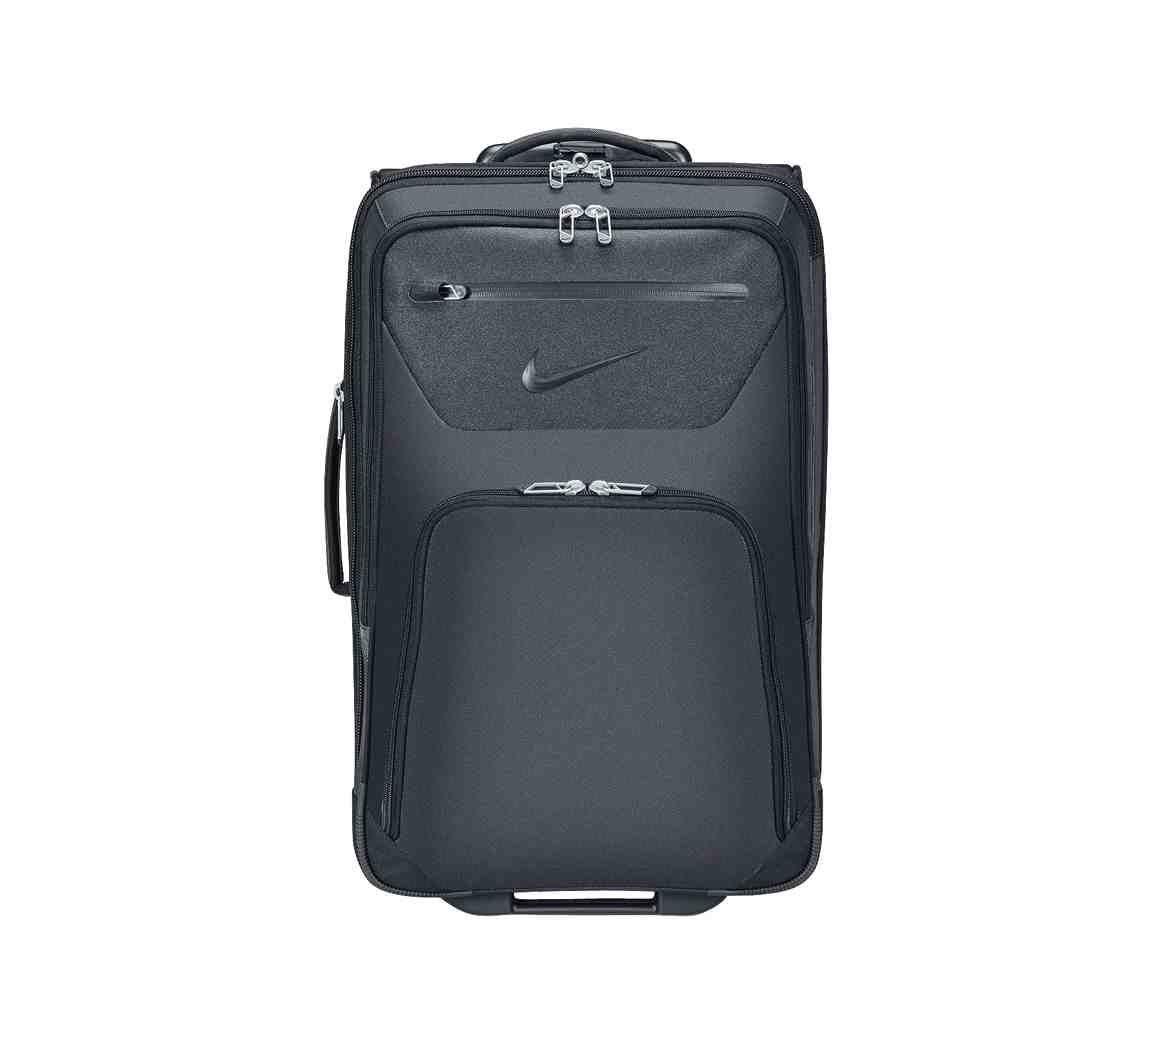 f52ace522bea Nike Rolling Duffle Bag